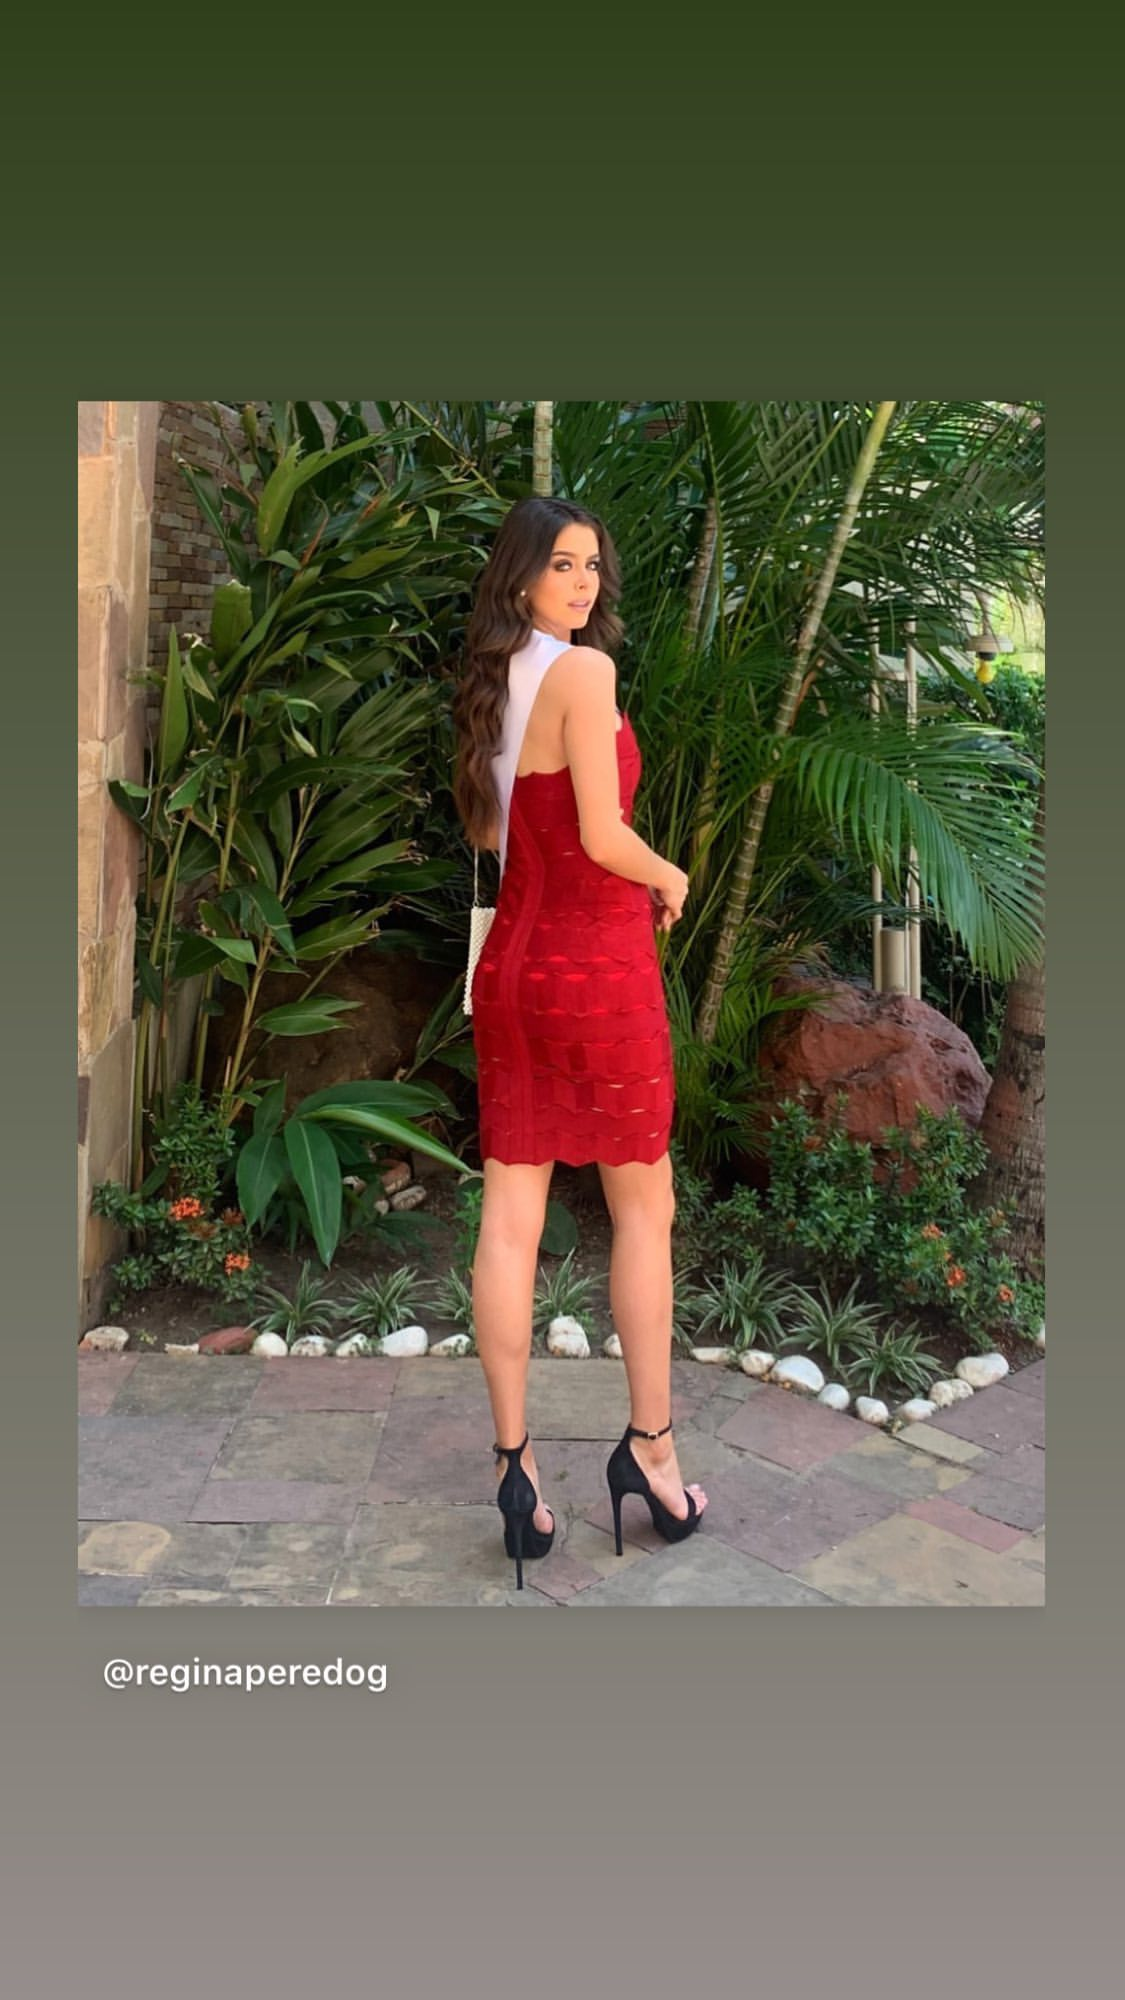 regina peredo, reyna hispanoamericana 2019. - Página 5 81768710